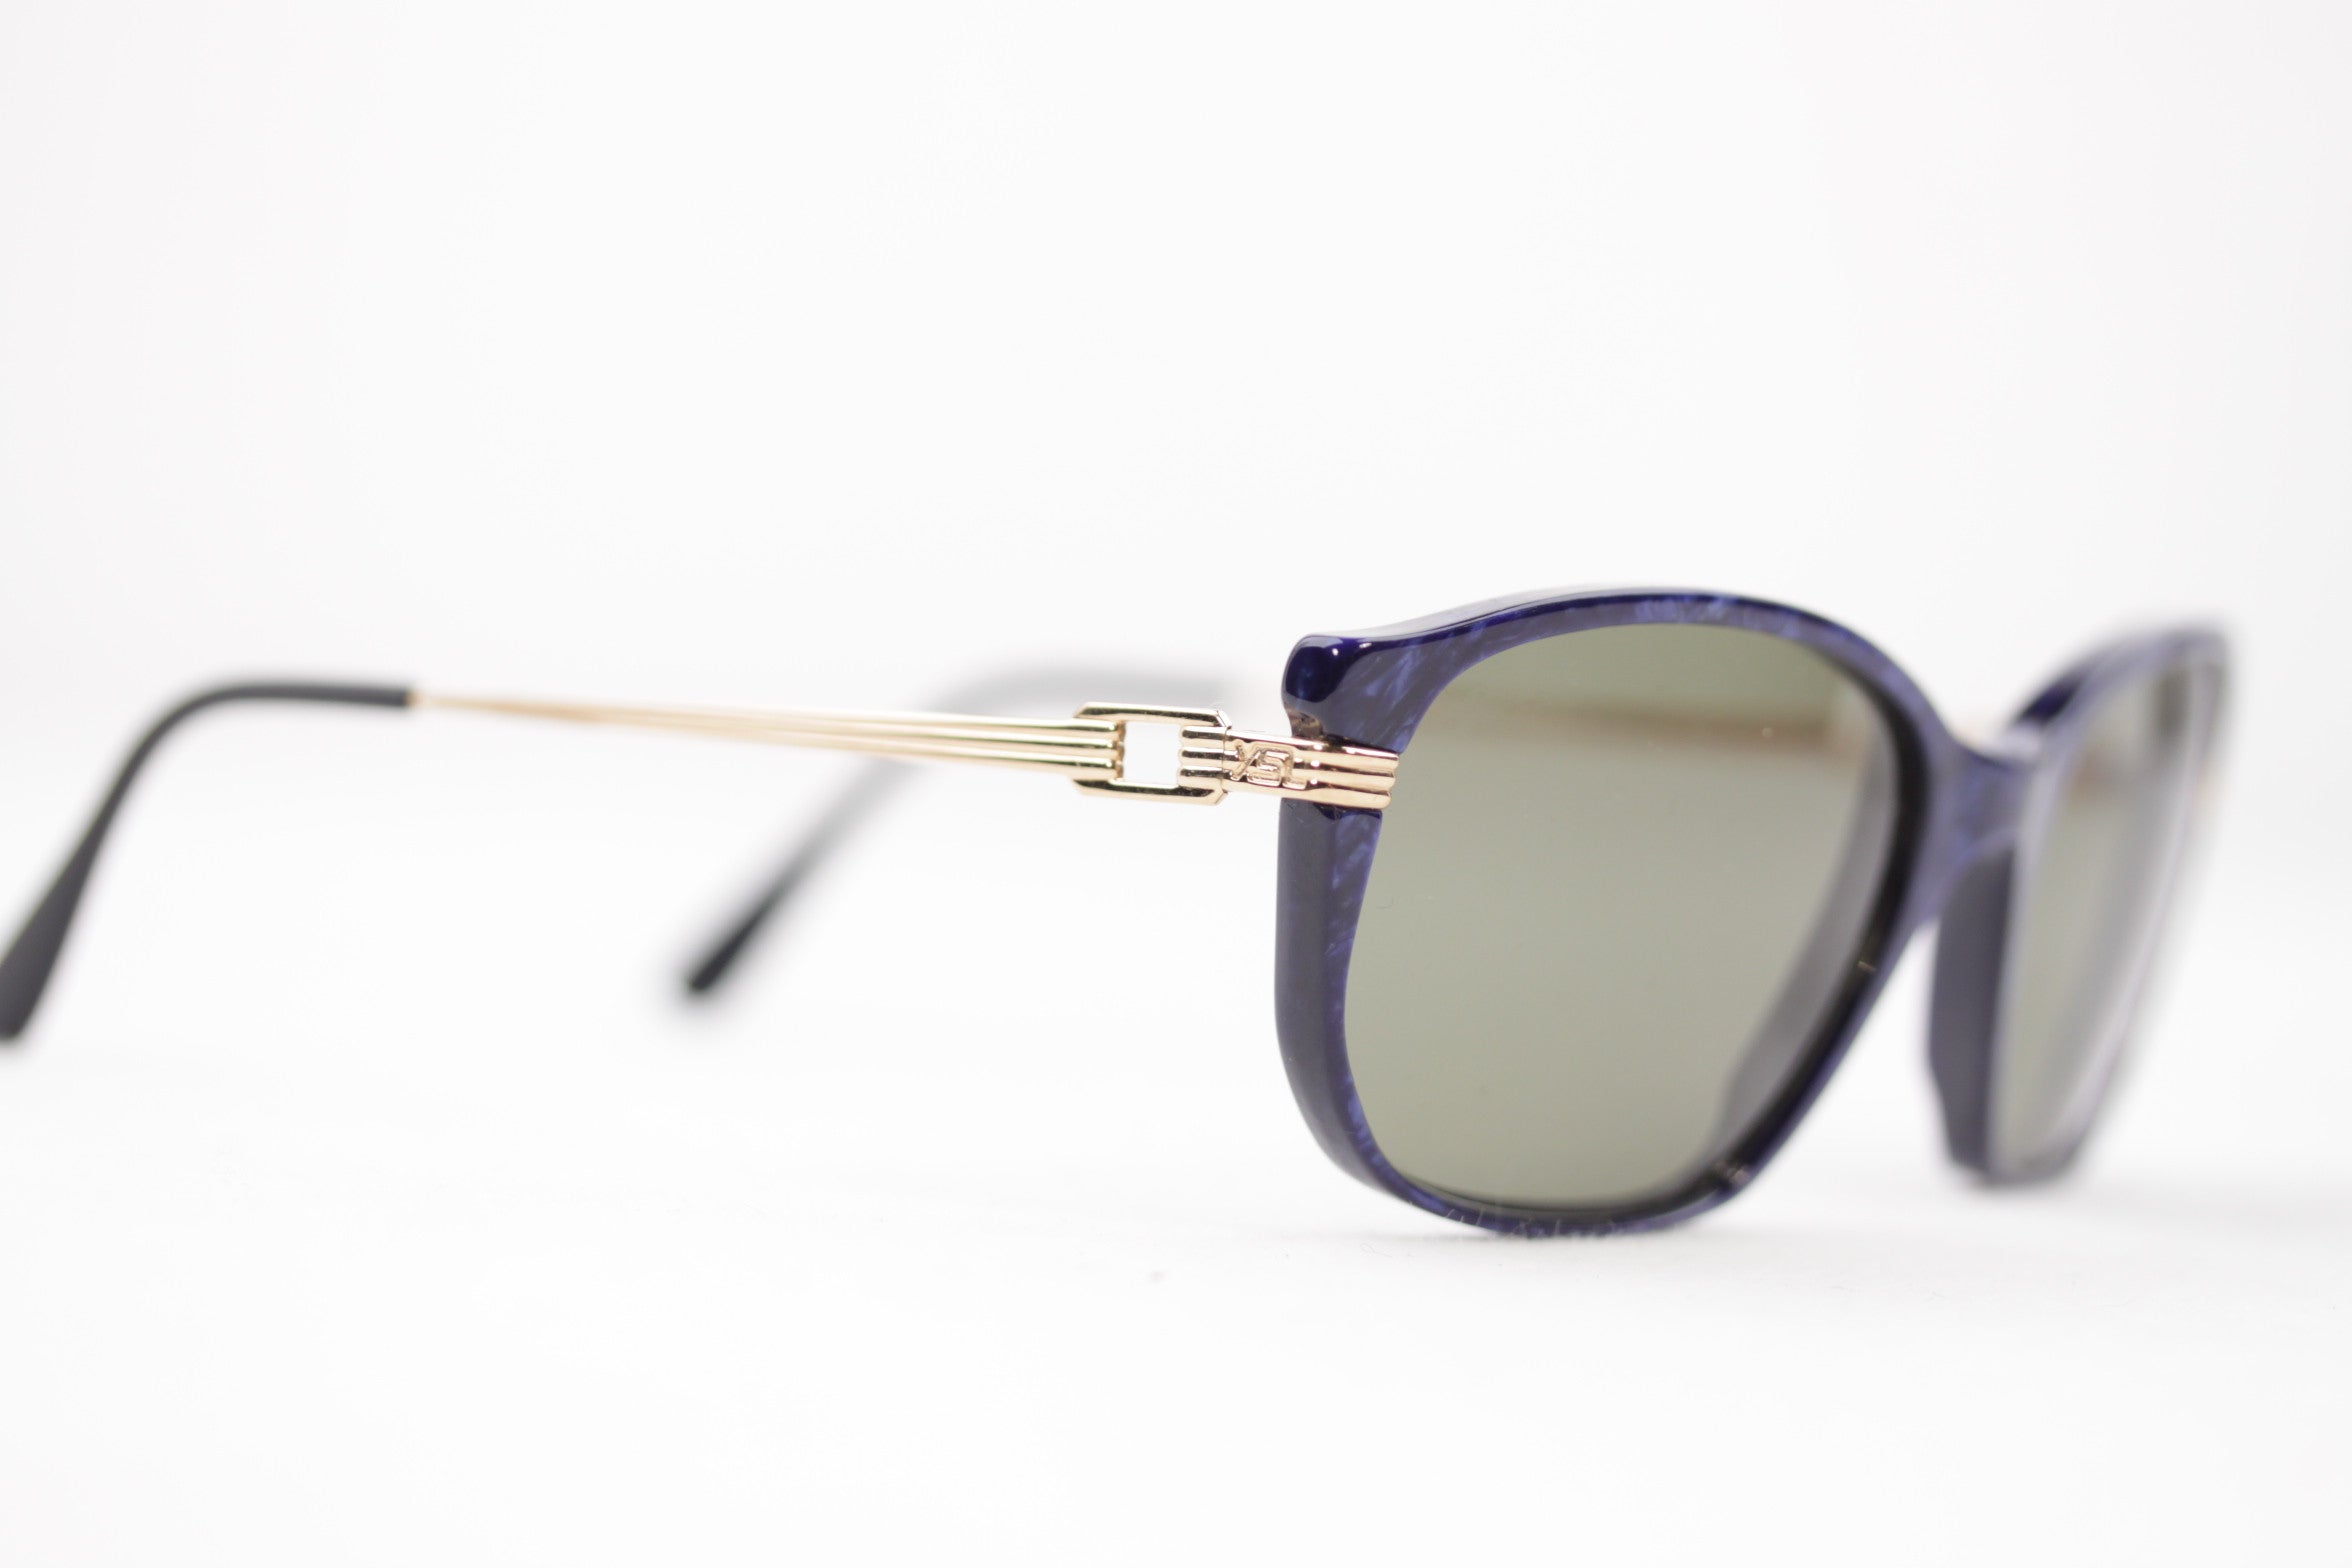 fda49484014f9 YVES SAINT LAURENT Vintage MINT womens SUNGLASSES TITHON 55 18 Eyewear For  Sale at 1stdibs